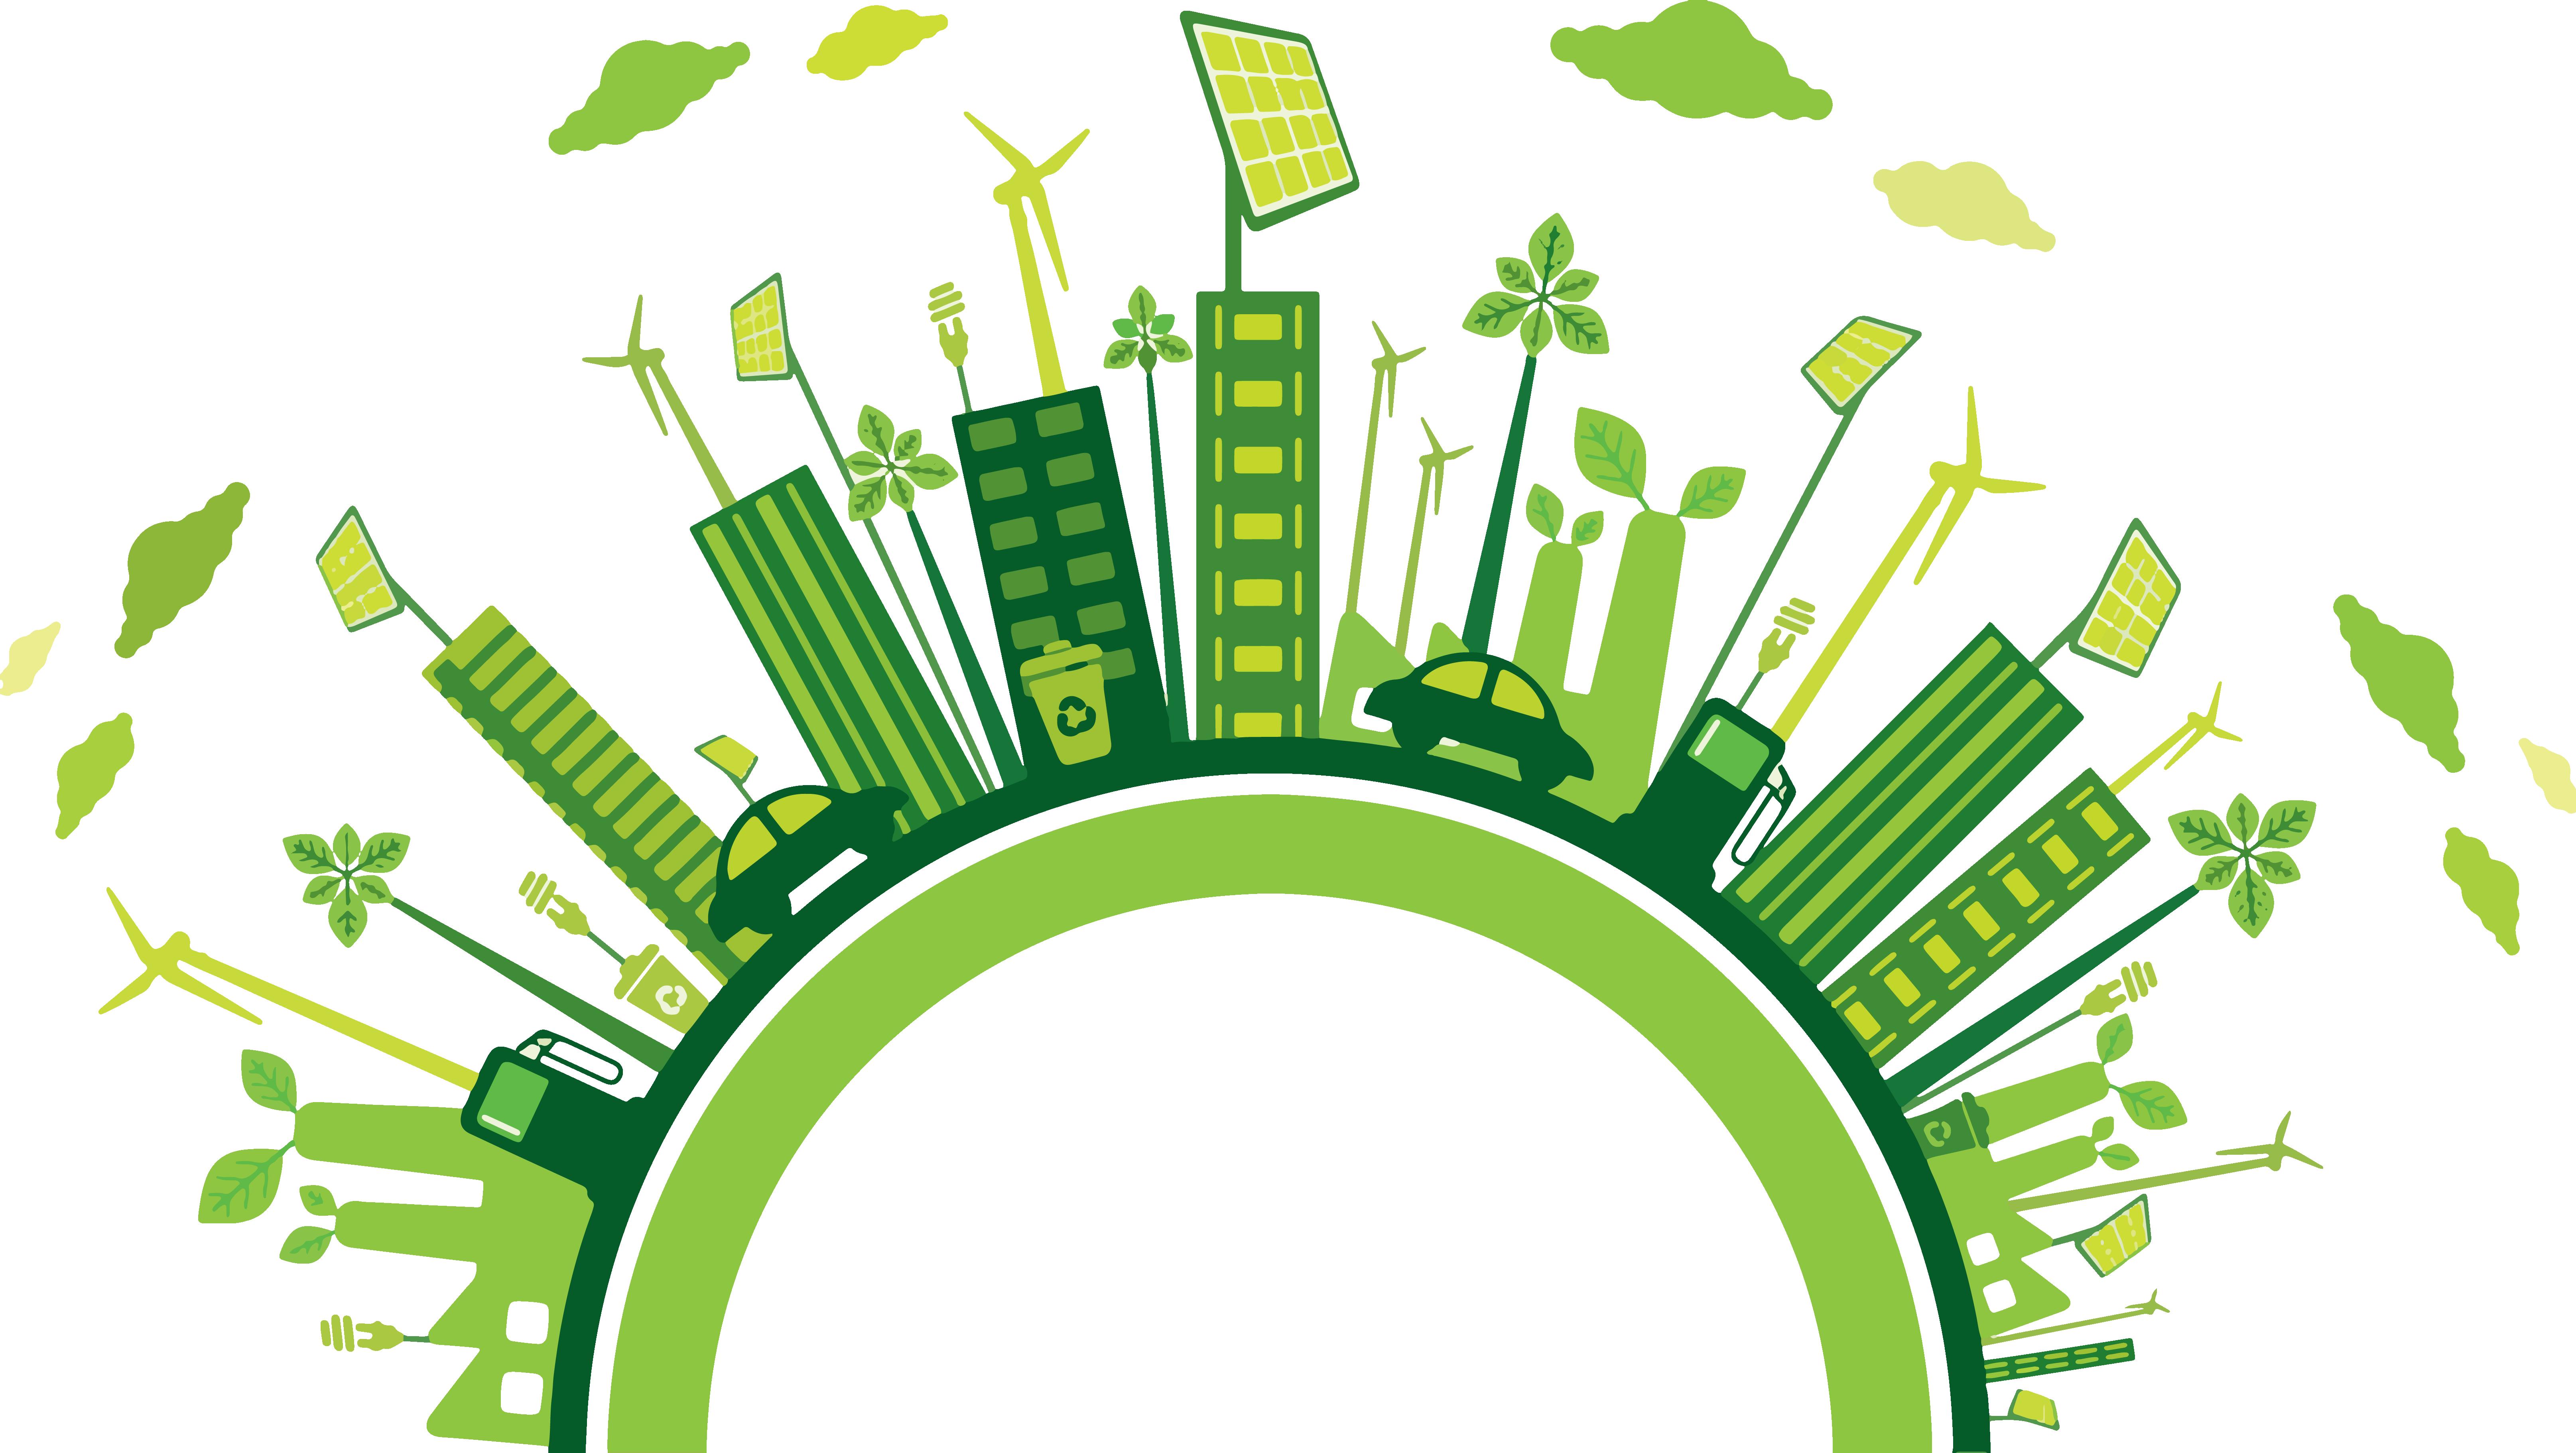 Go green clipart images svg transparent stock go-green-web1 - EcoSoch Solar svg transparent stock